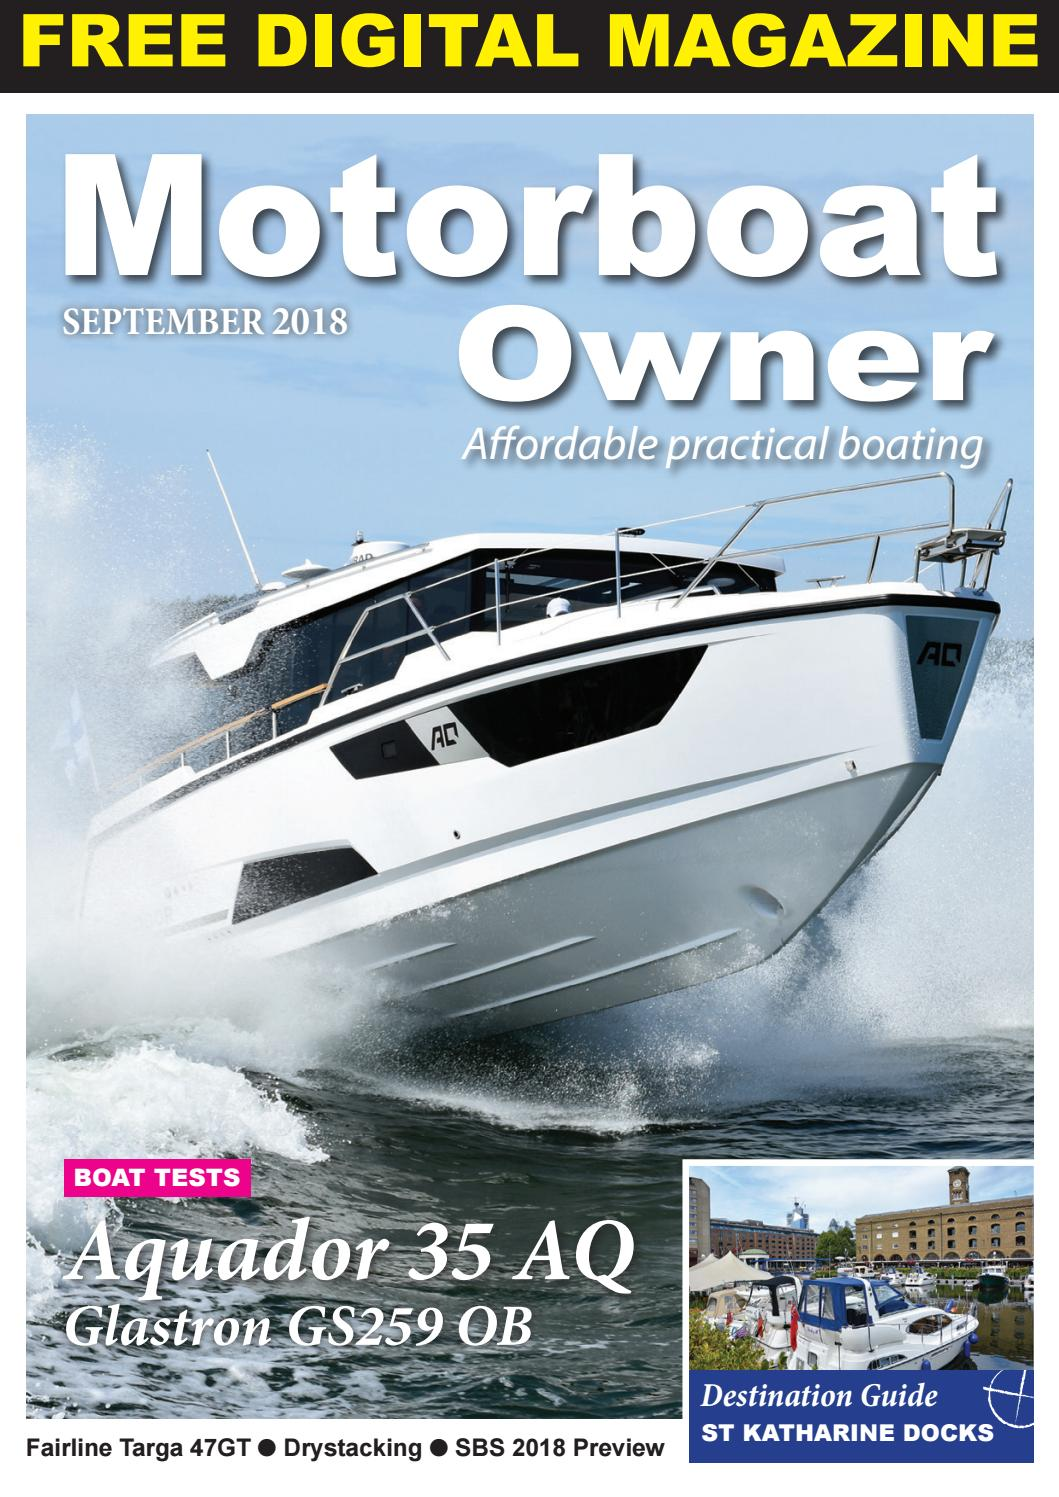 Motorboat Owner September 2018 by Digital Marine Media Ltd